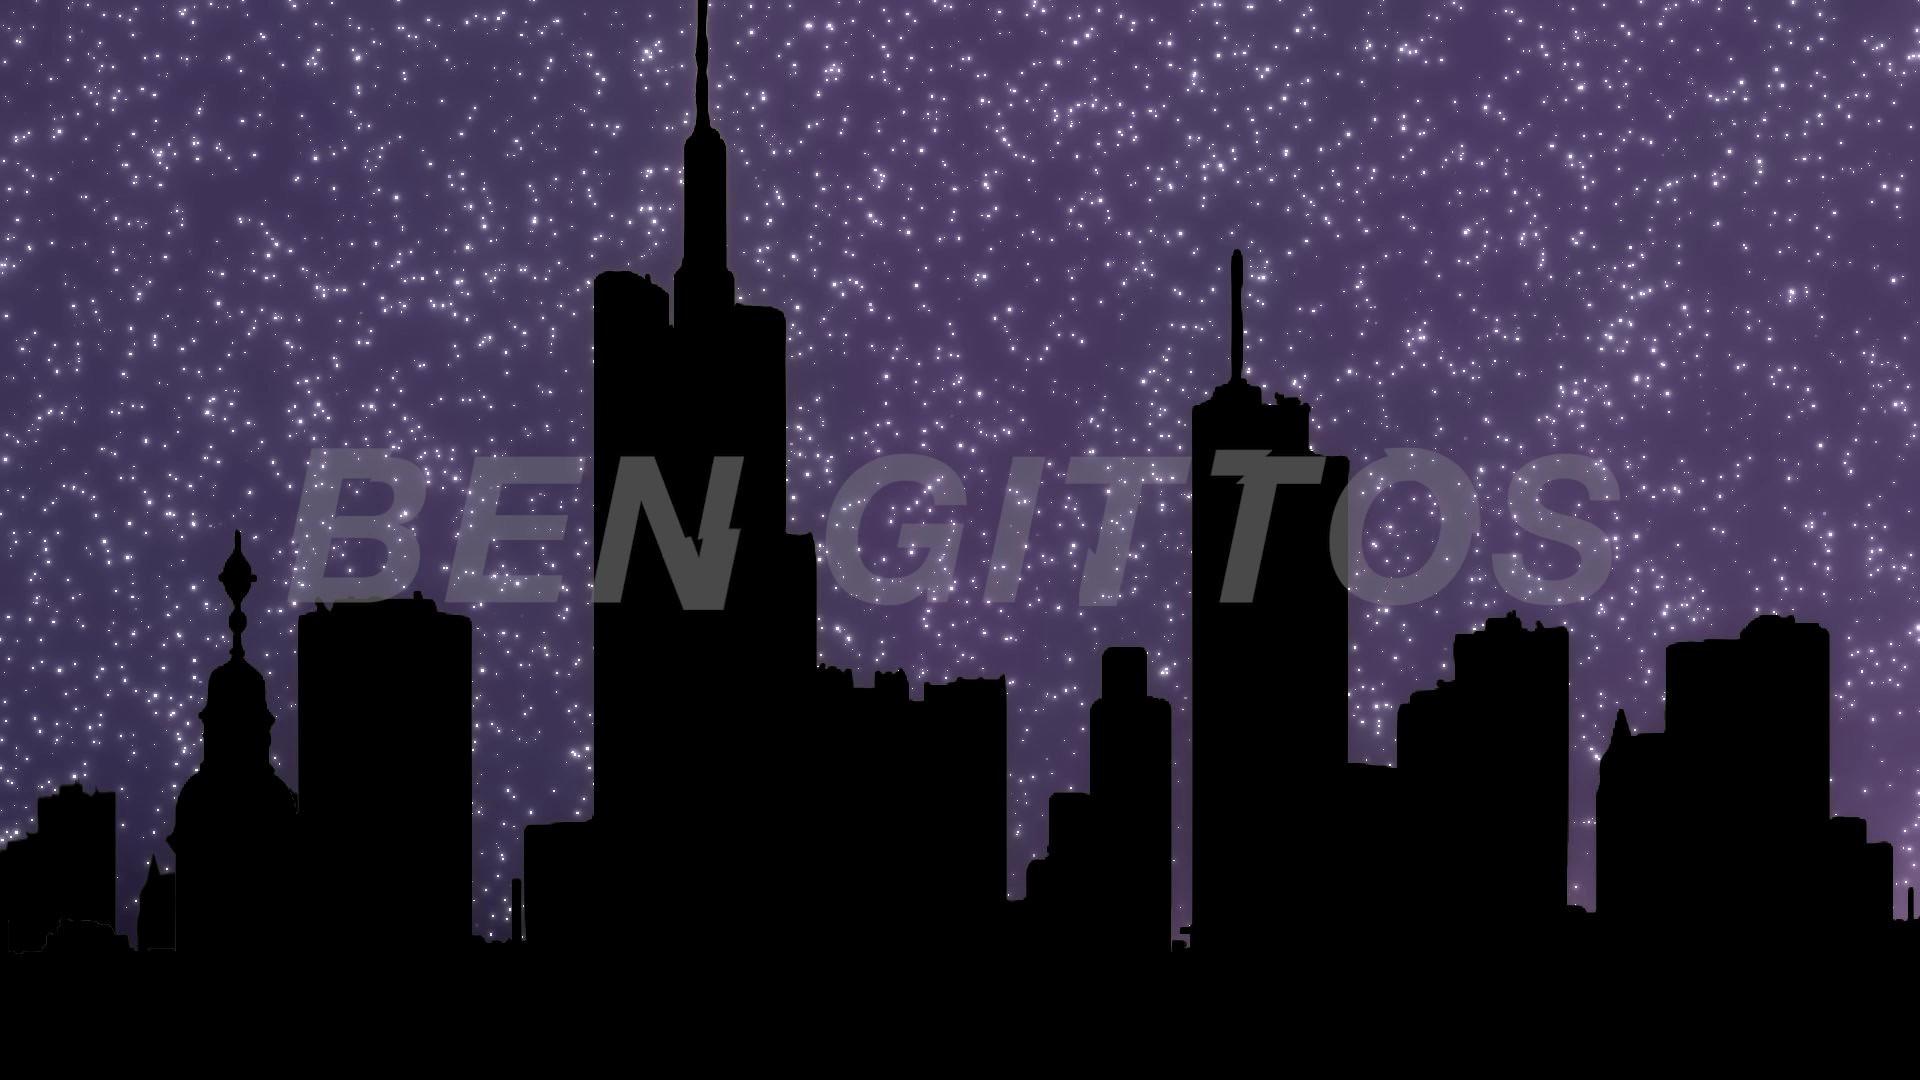 notch_city_layer_new-york_h264.mp4